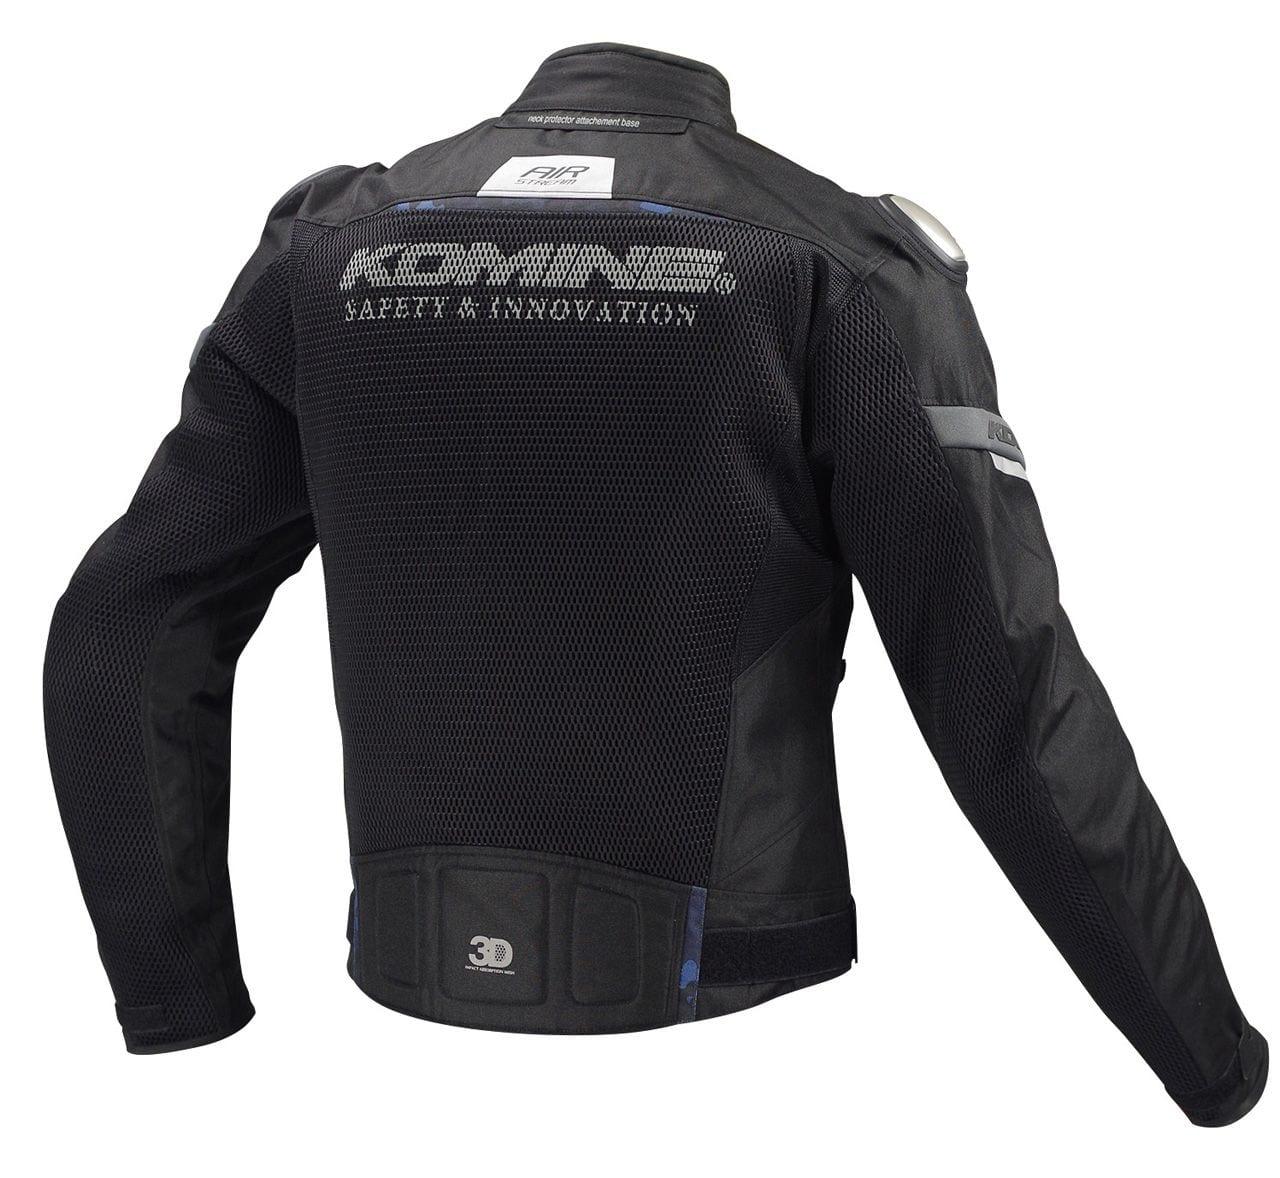 Komine Jk 107 Titanium Mesh Motorcycle Jacket Ce Protectors